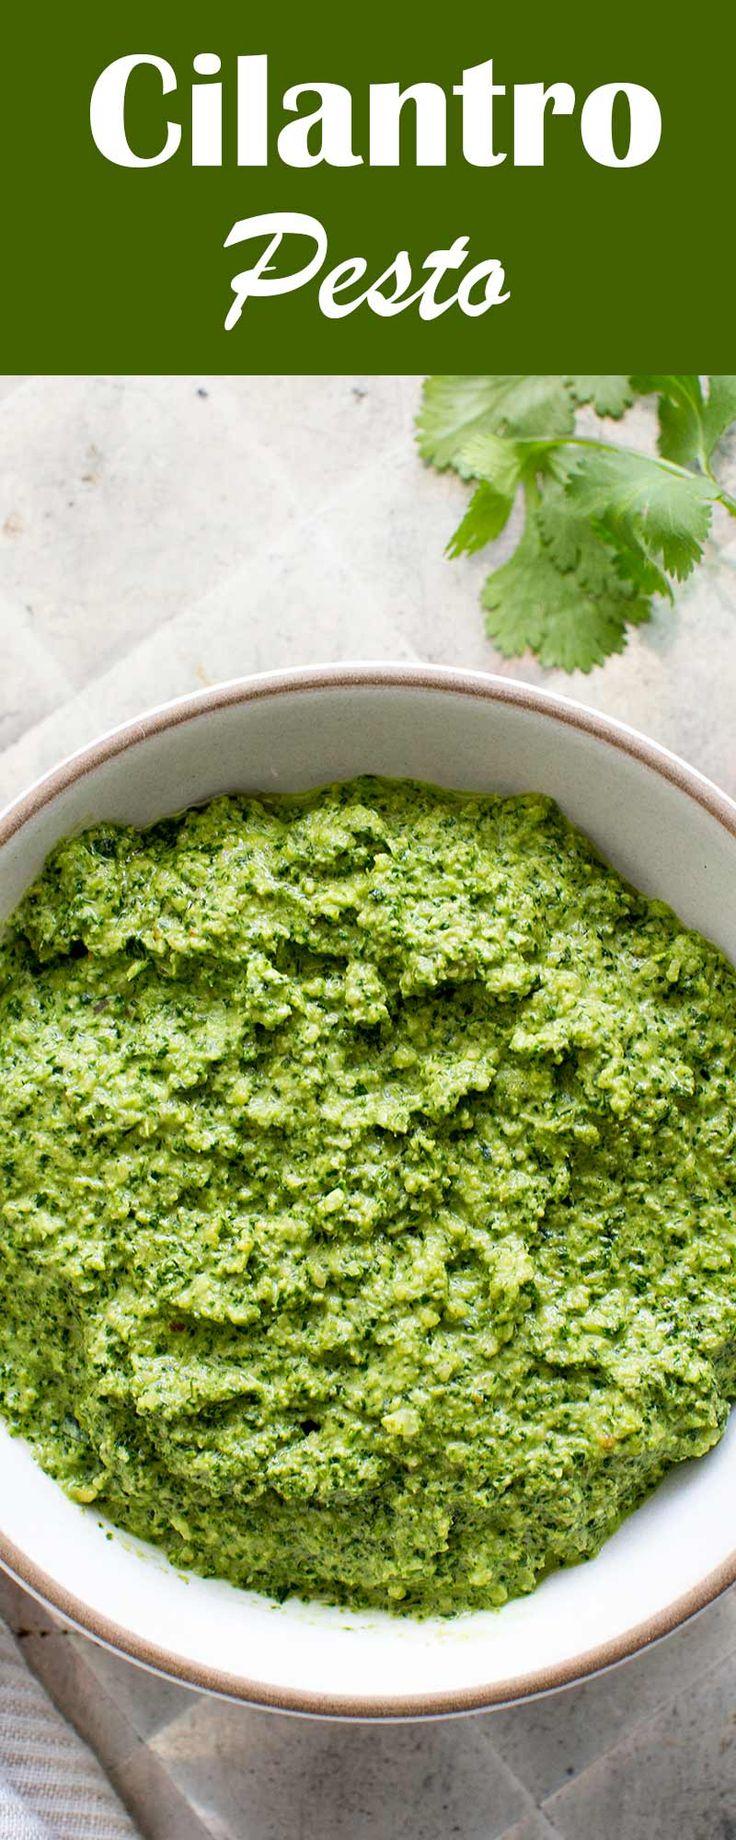 Cilantro Pesto! VEGAN made with fresh cilantro leaves, blanched almonds, red onion, serrano chile and olive oil.